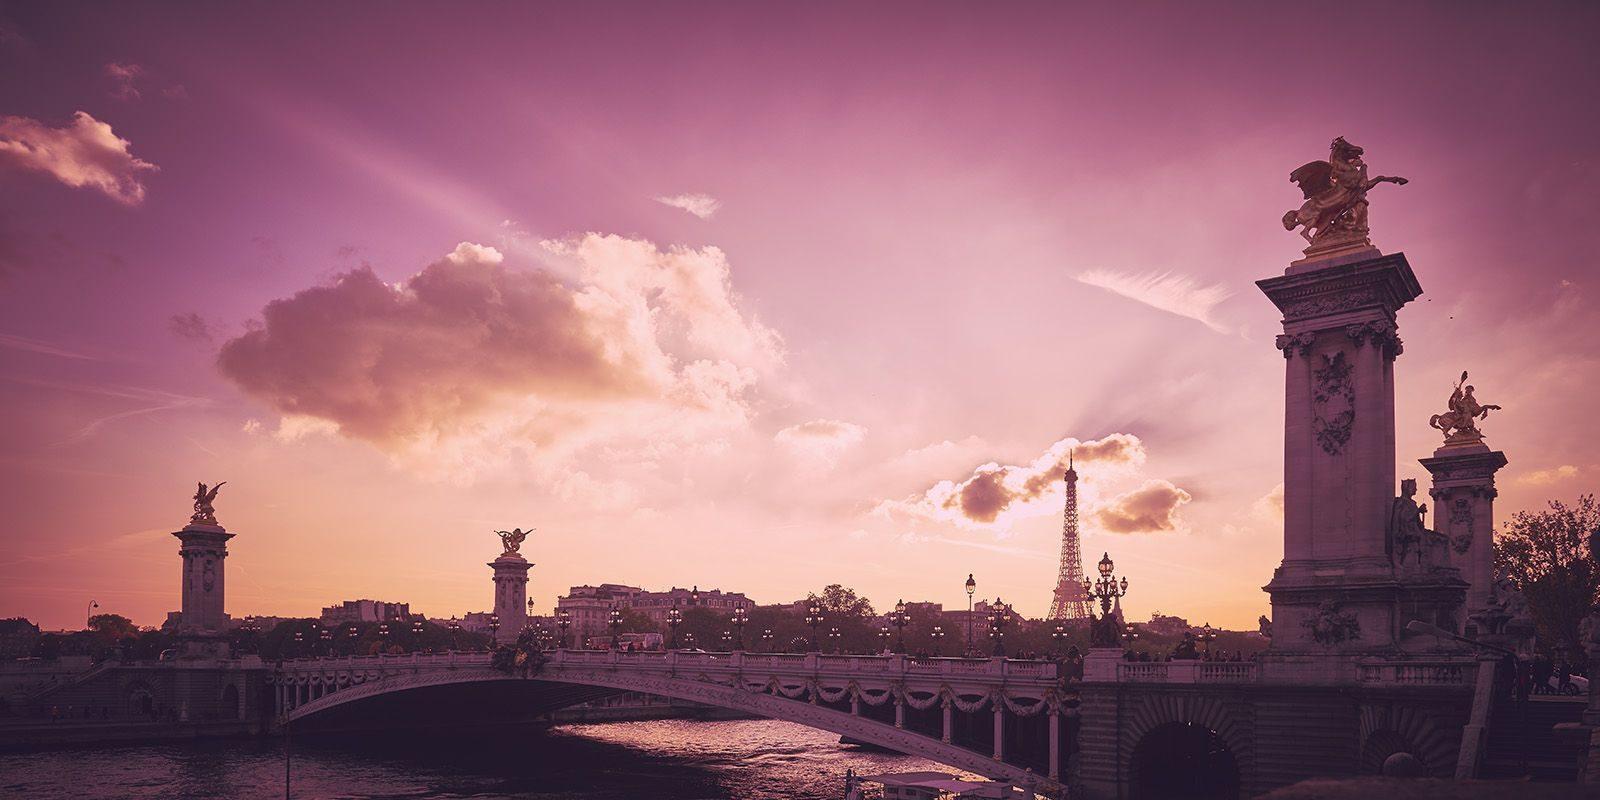 Pont Alexandre III av Peder Aaserud Eikeland